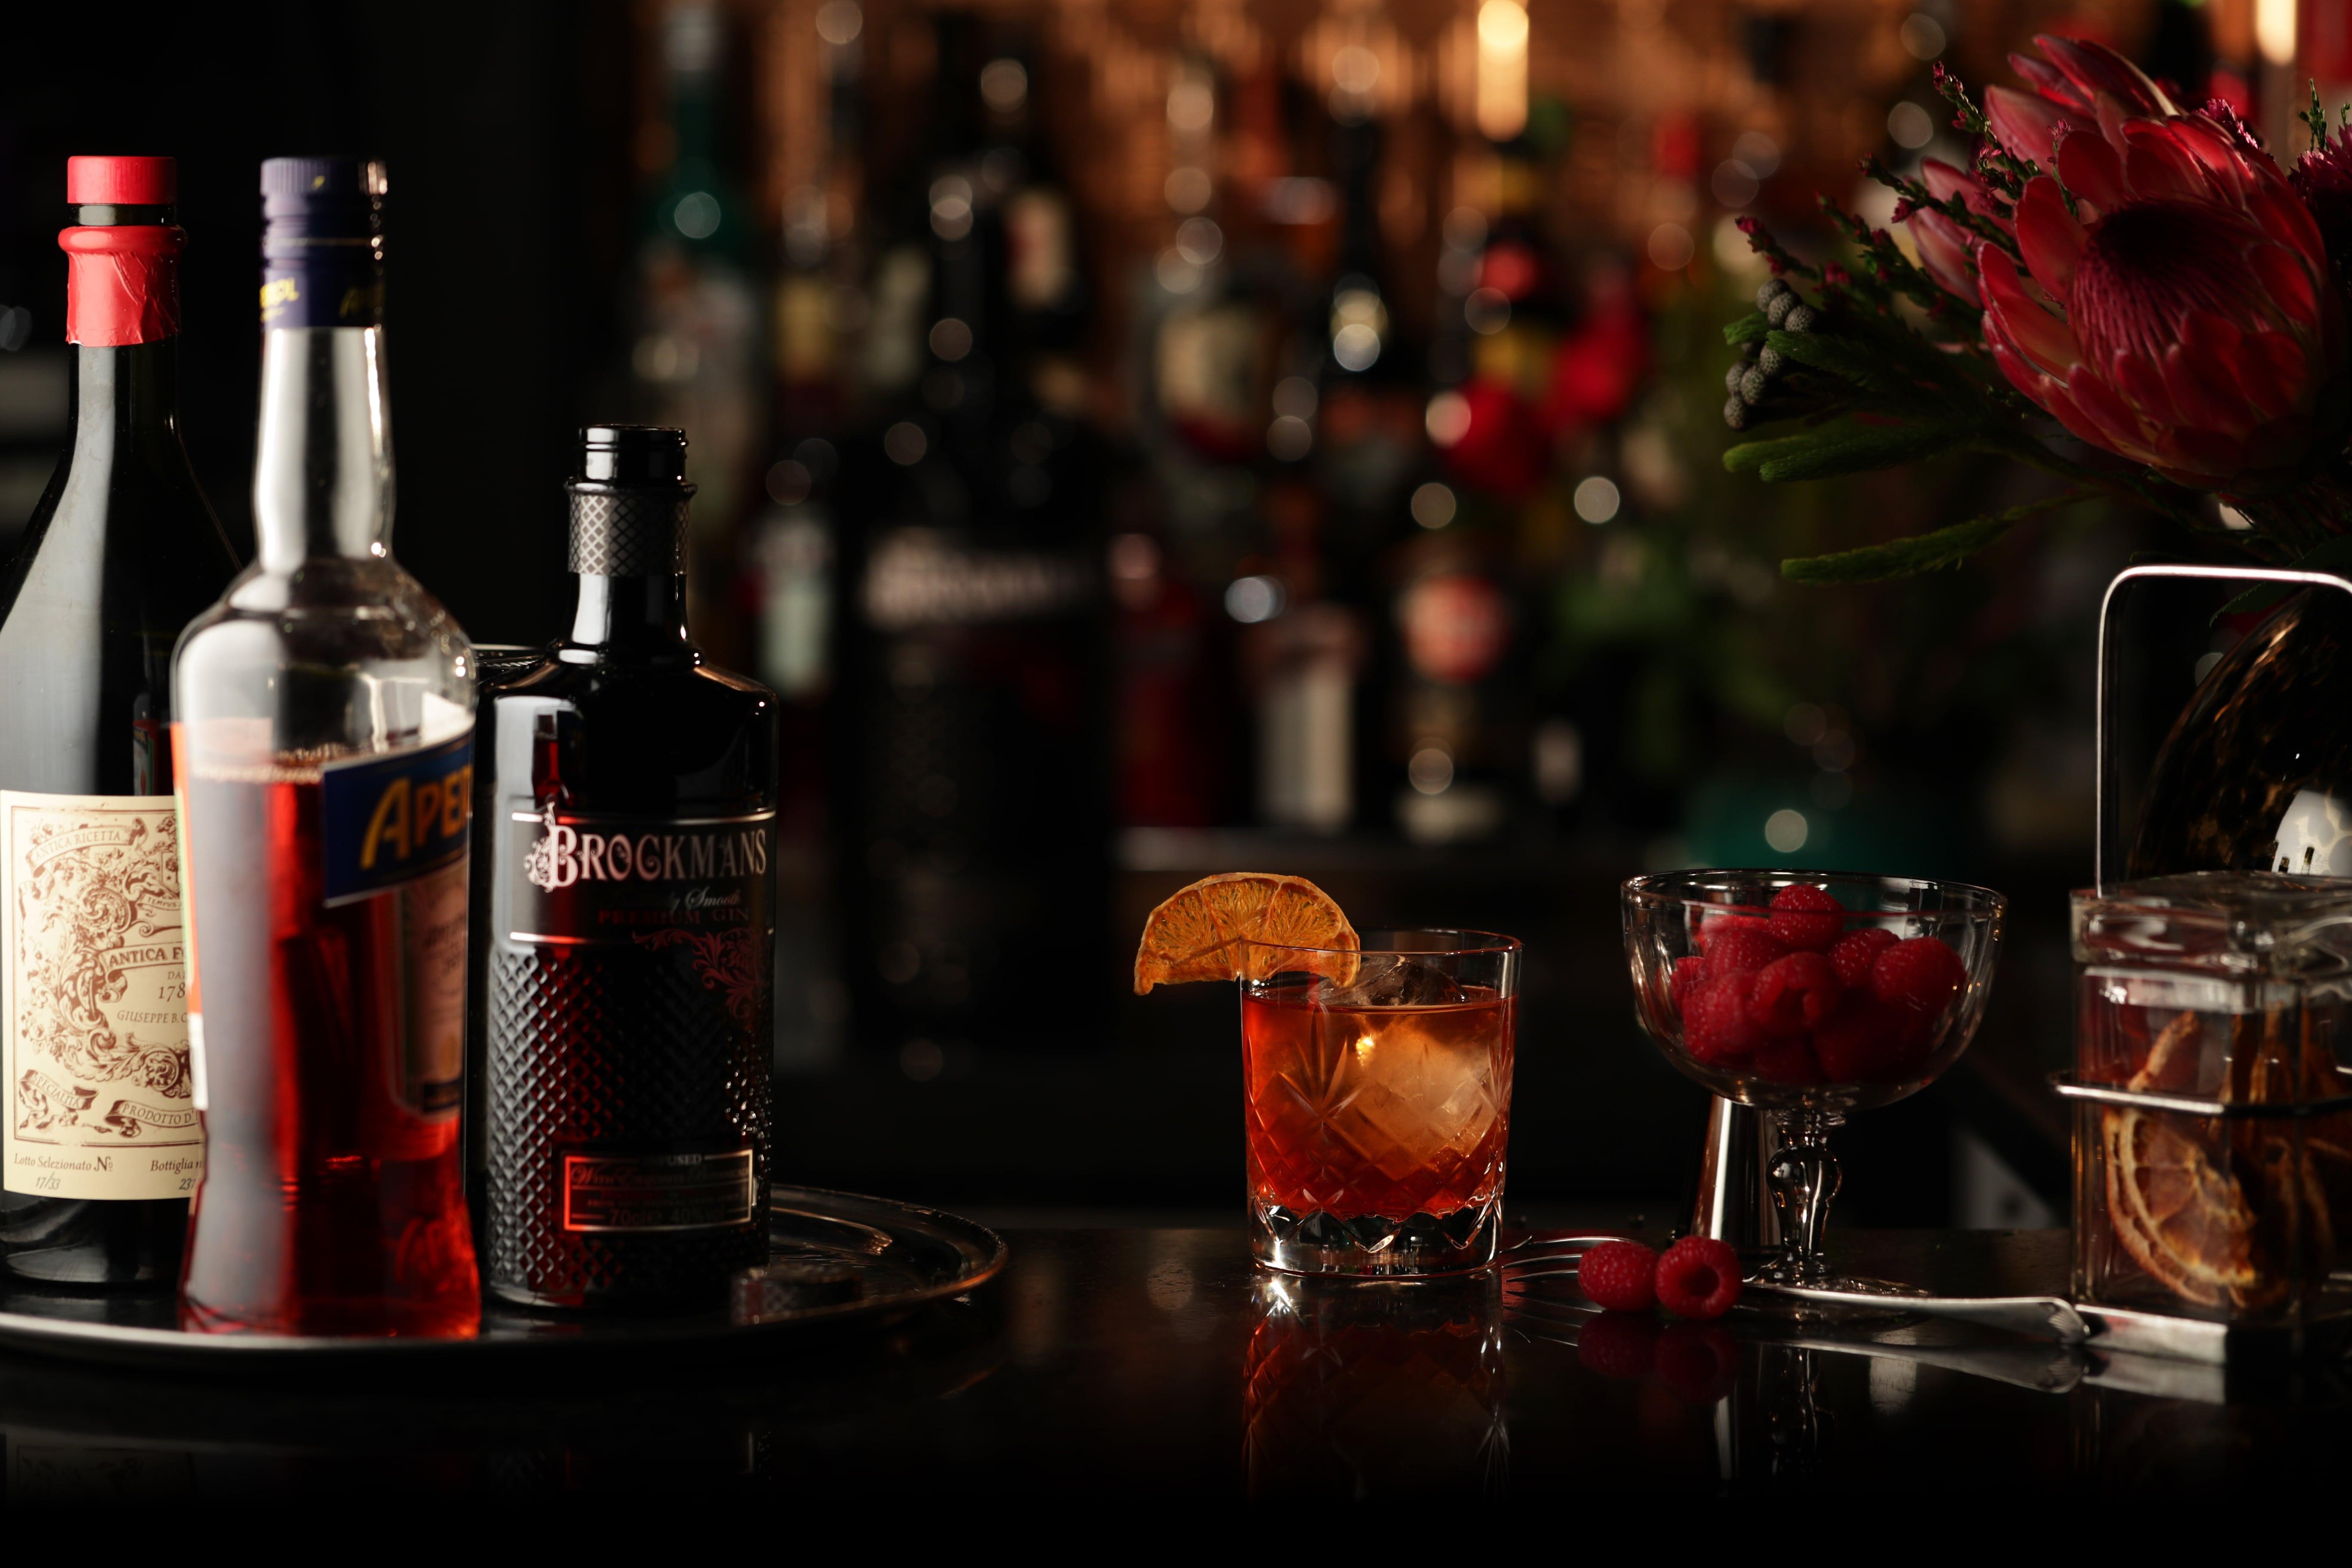 Brockmans Gin Summer Negroni